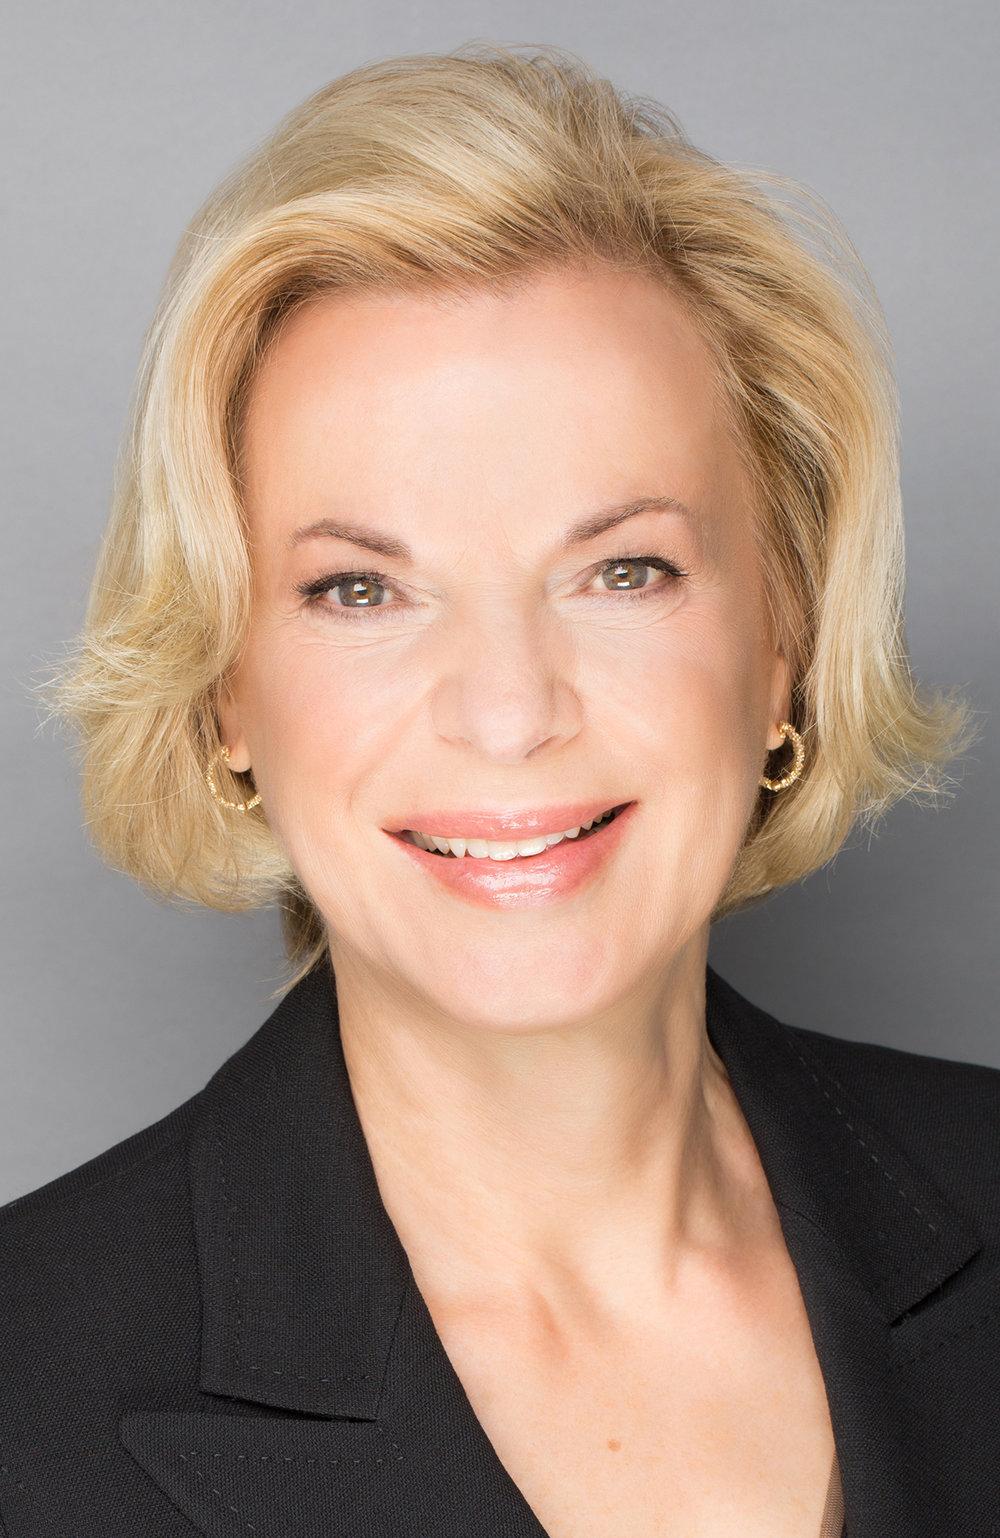 Dr. Betsy Nabel (President, Brigham Health)